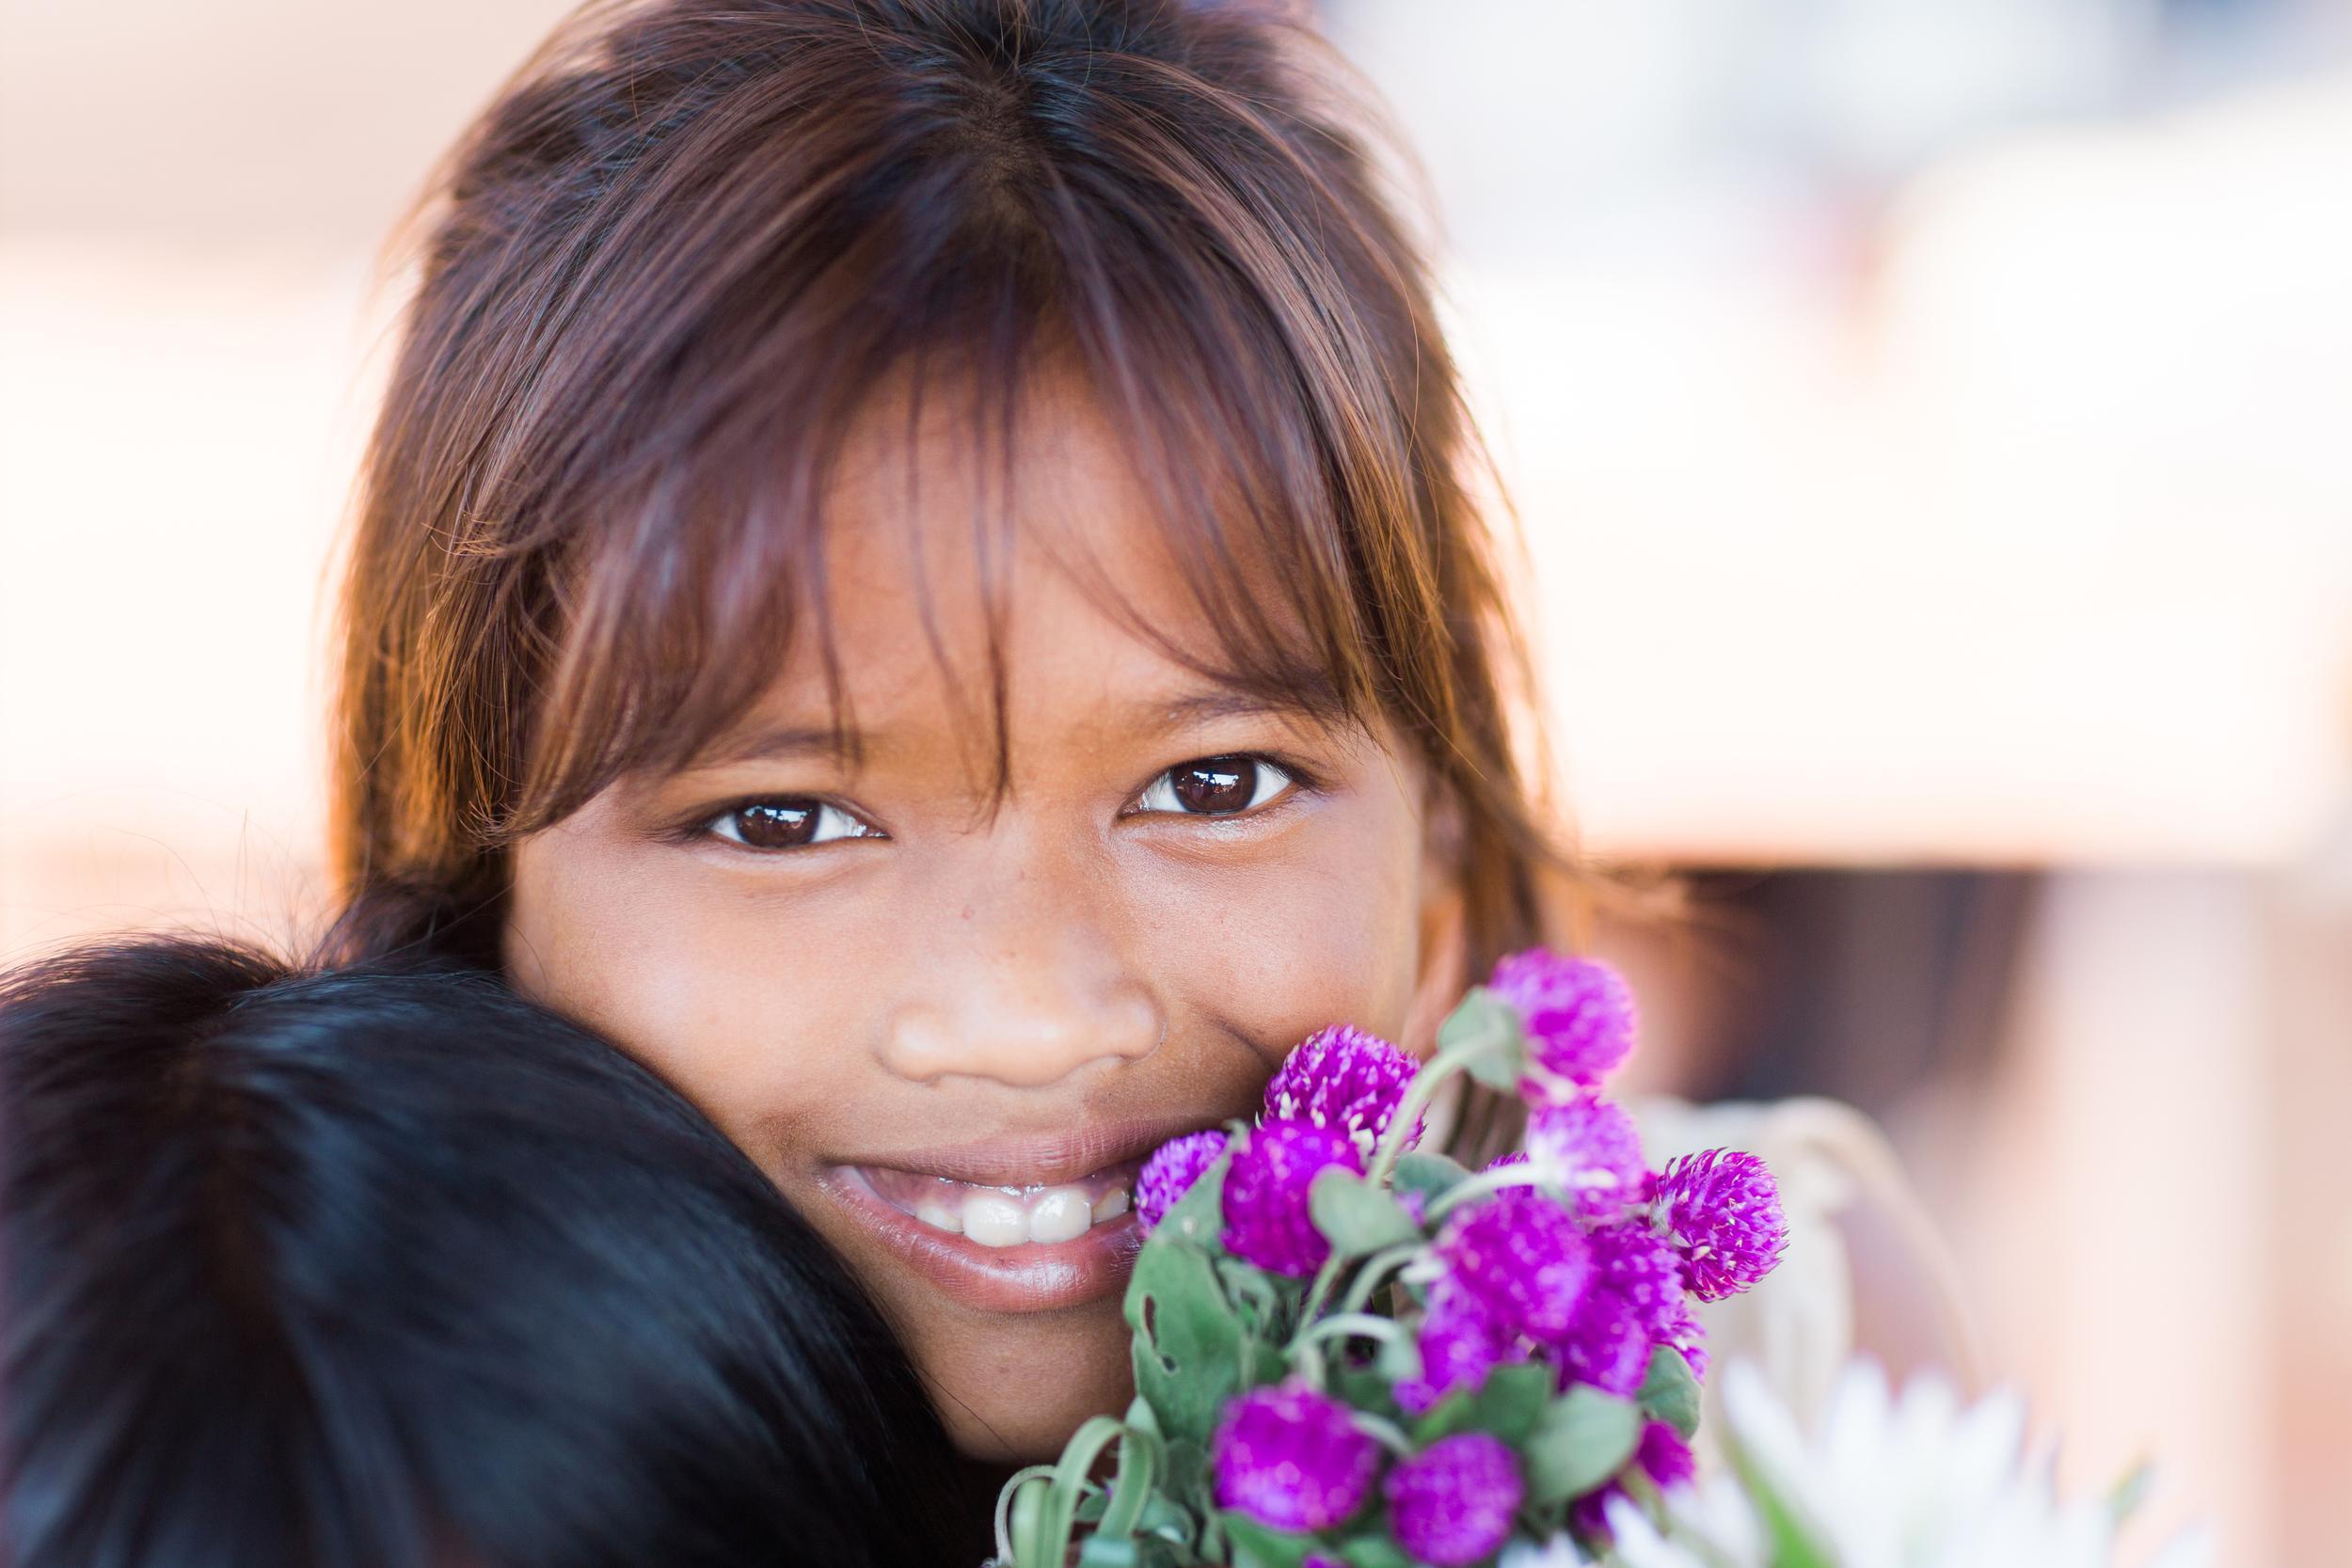 Cari Zhu Photography - Cambodia Siem Reap South East Asia Travel-1652.jpg